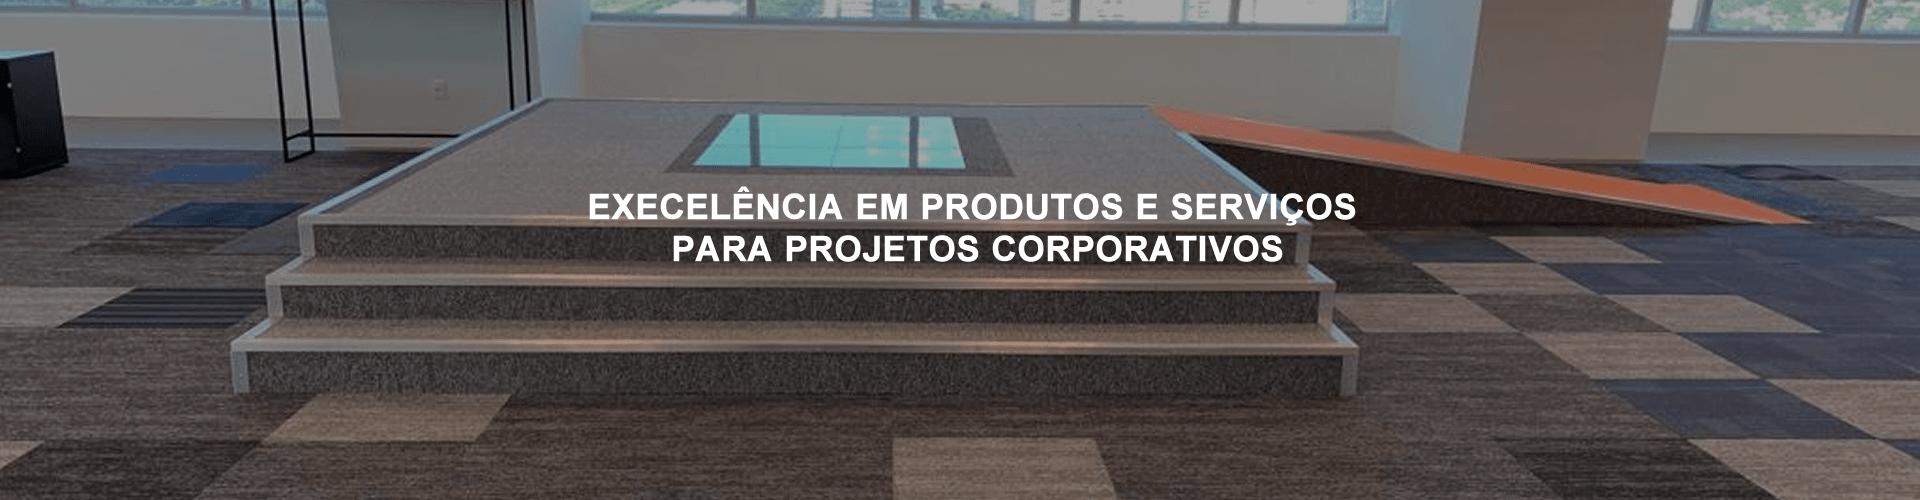 Carpetes para Ambientes Empresariais